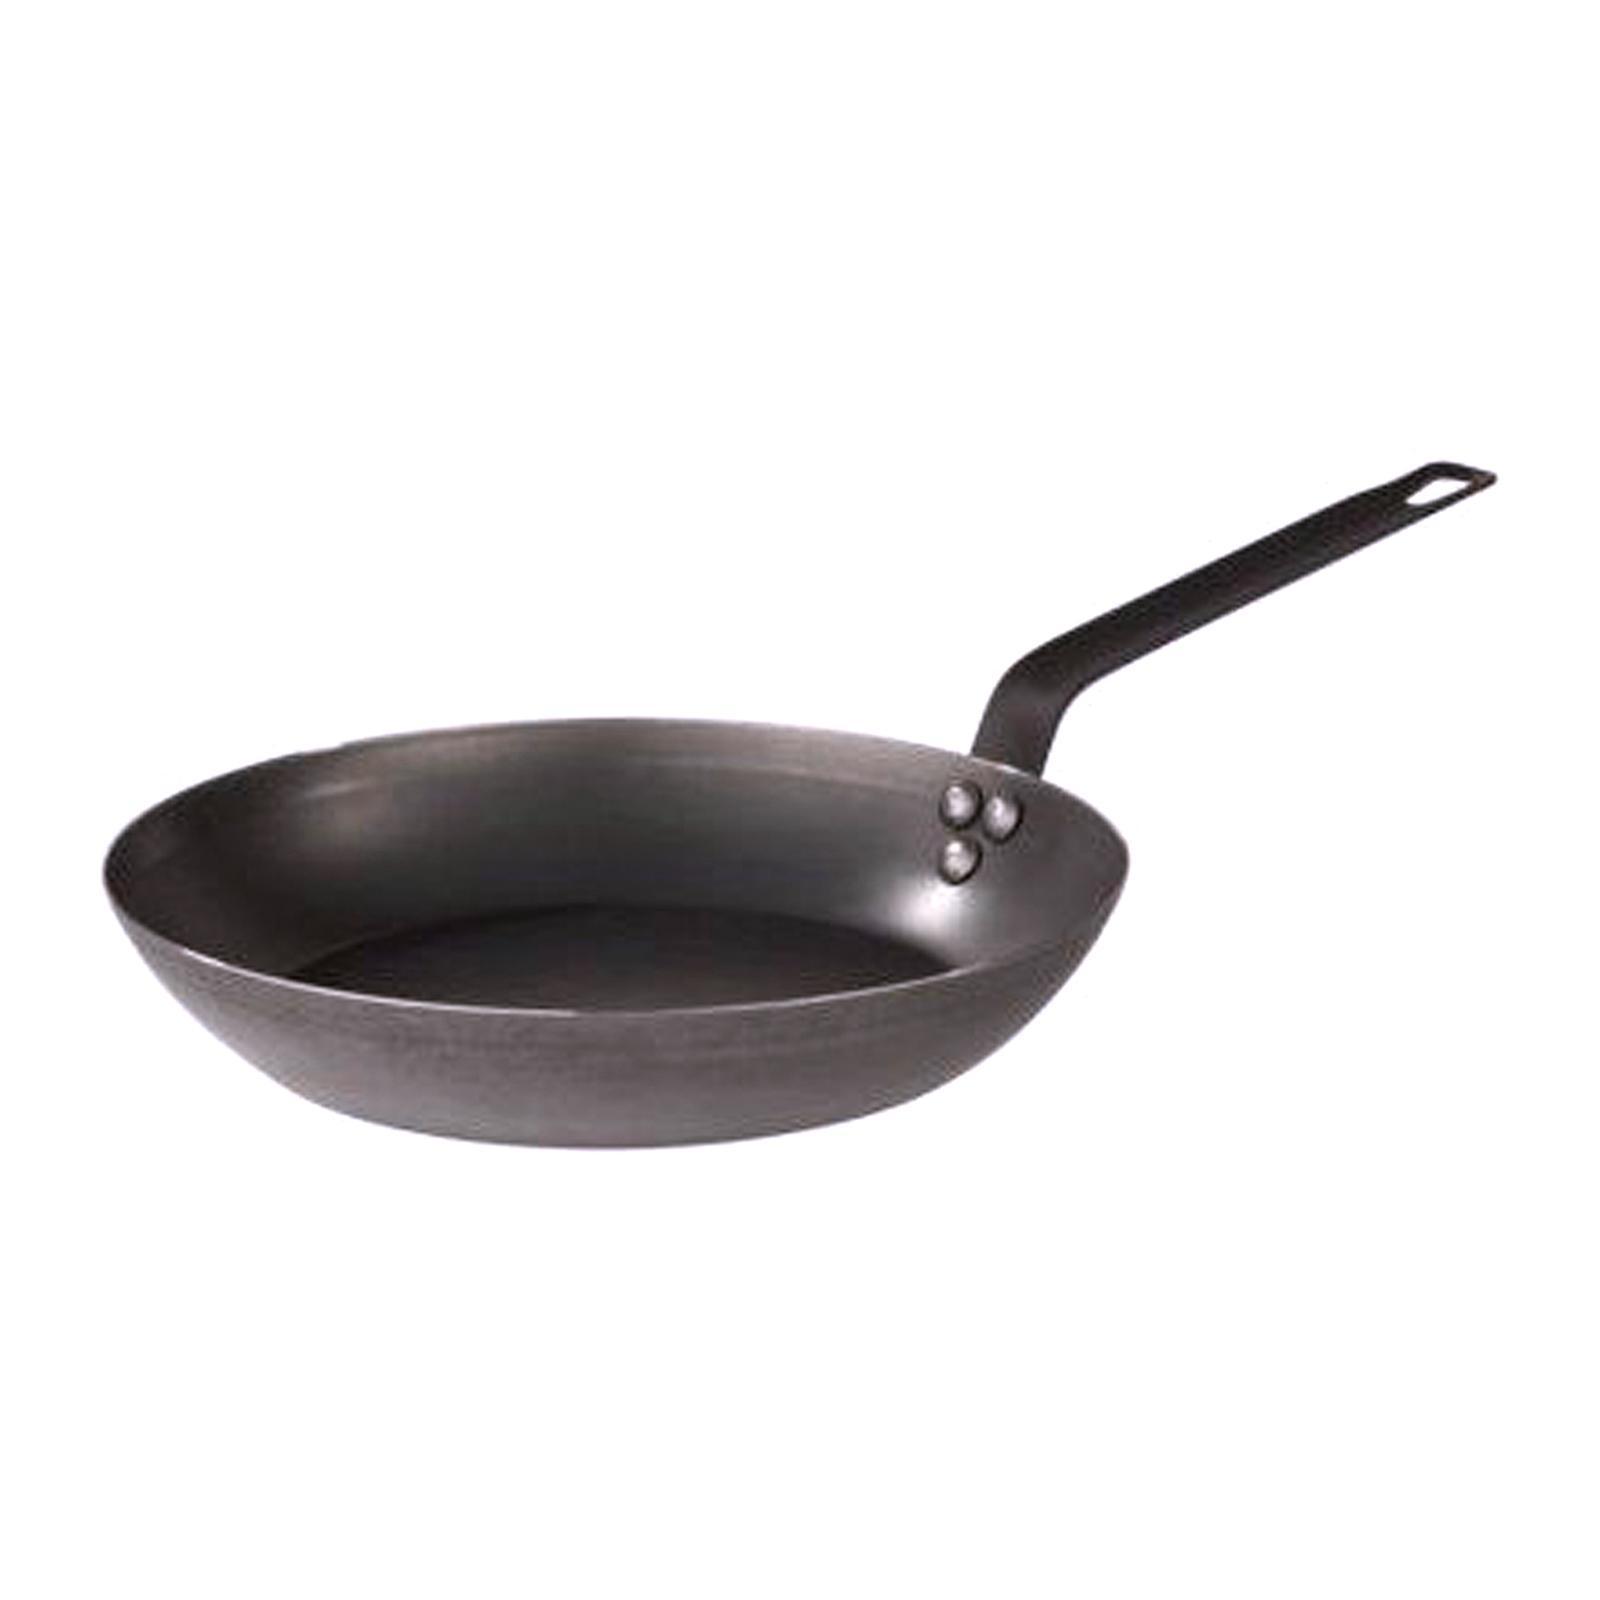 Pujadas Carbon Steel Lyonnaise Fry Pan 24Cm